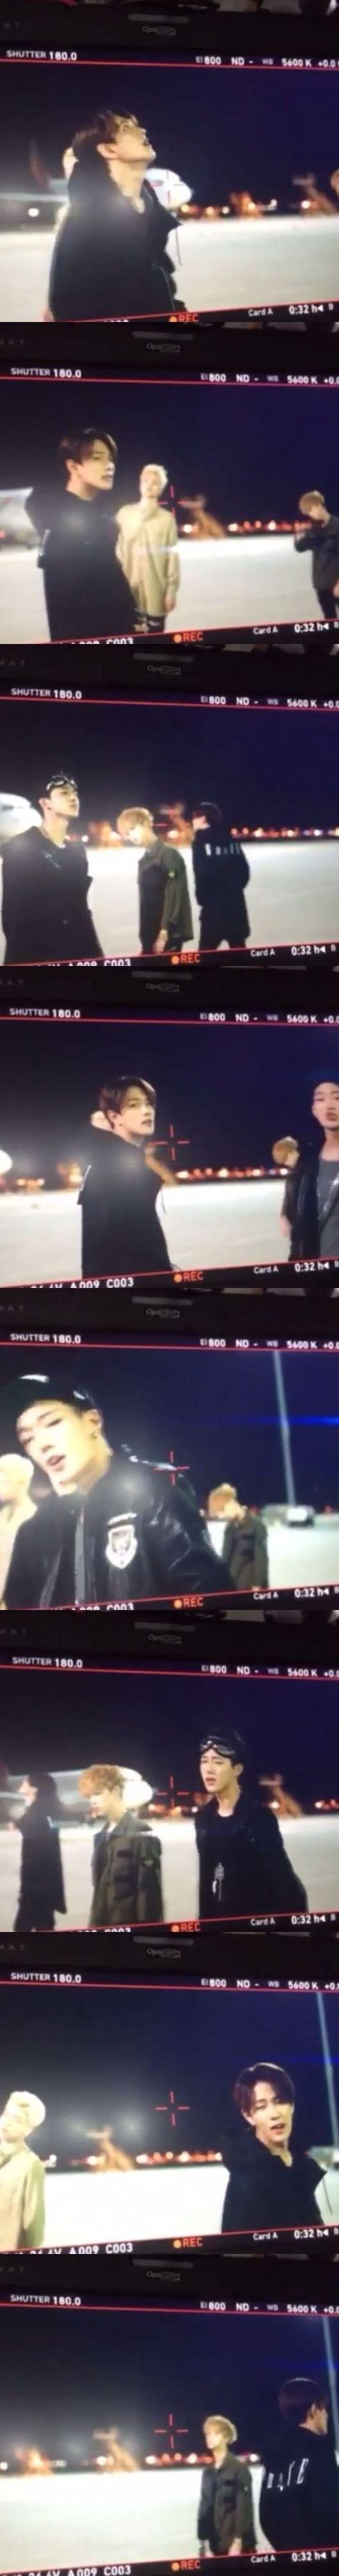 iKON、感受性豊かなヒップホップソングを準備中?MVの一部をYGヤン・ヒョンソク代表が公開